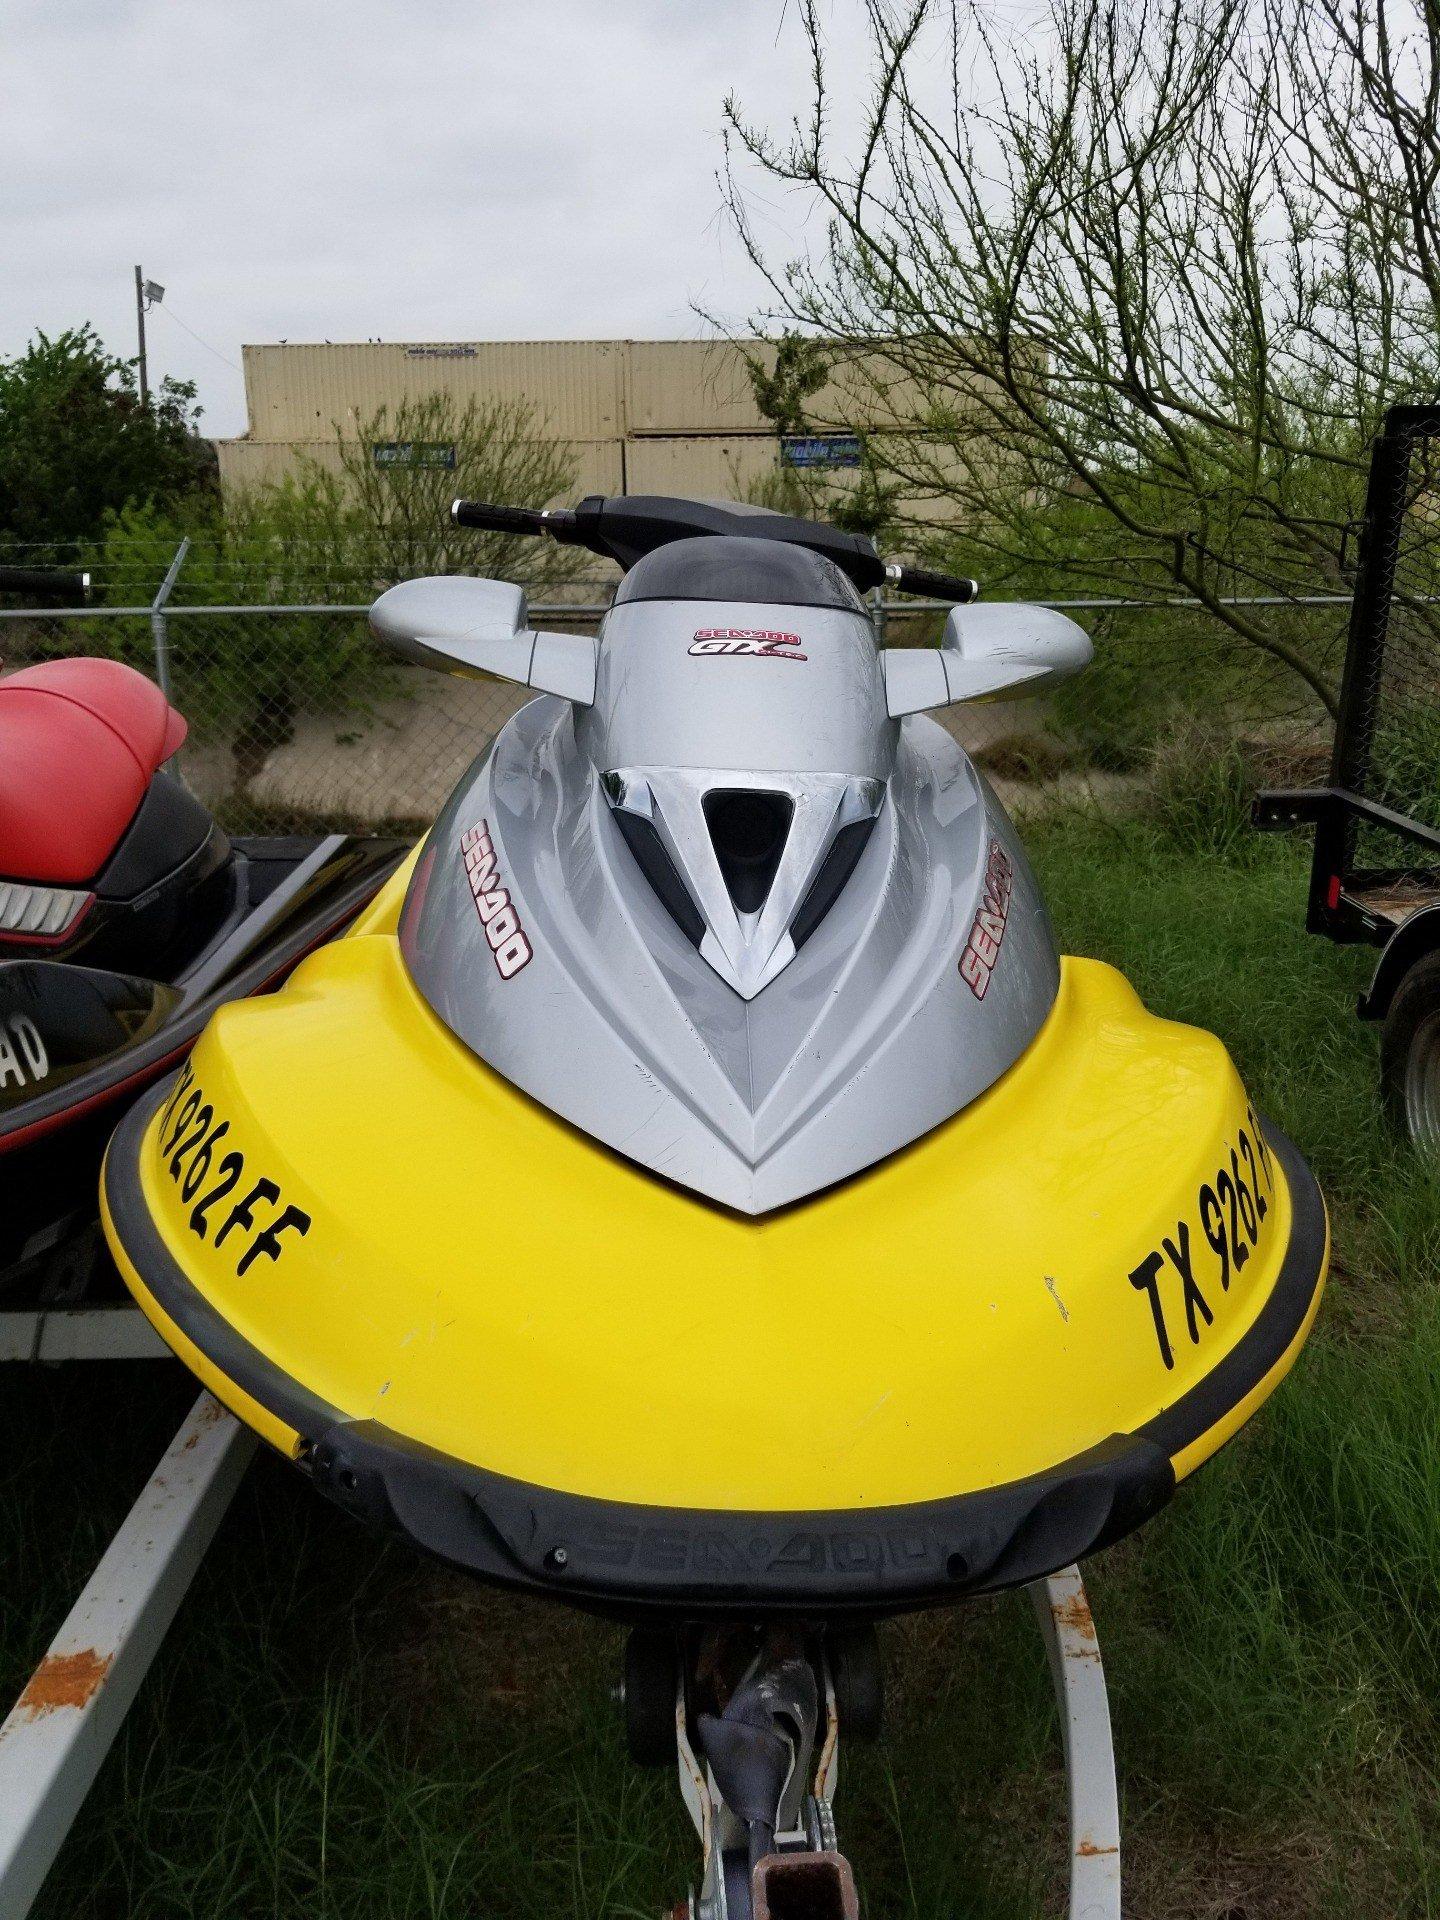 2003 Sea-Doo GTX 4-TEC Supercharged in Laredo, Texas